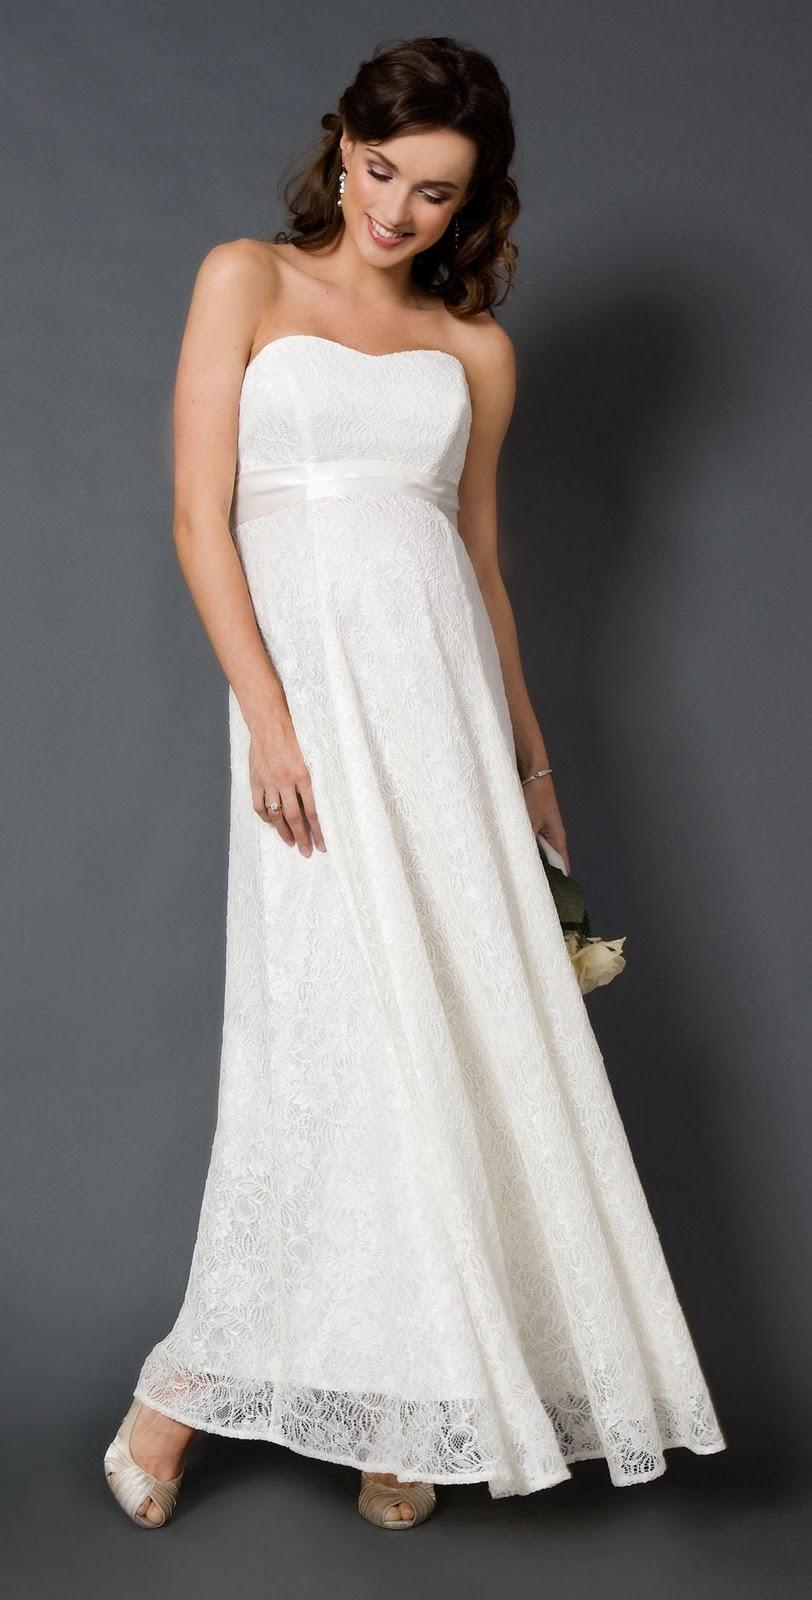 Savona Ivory Wedding Gown